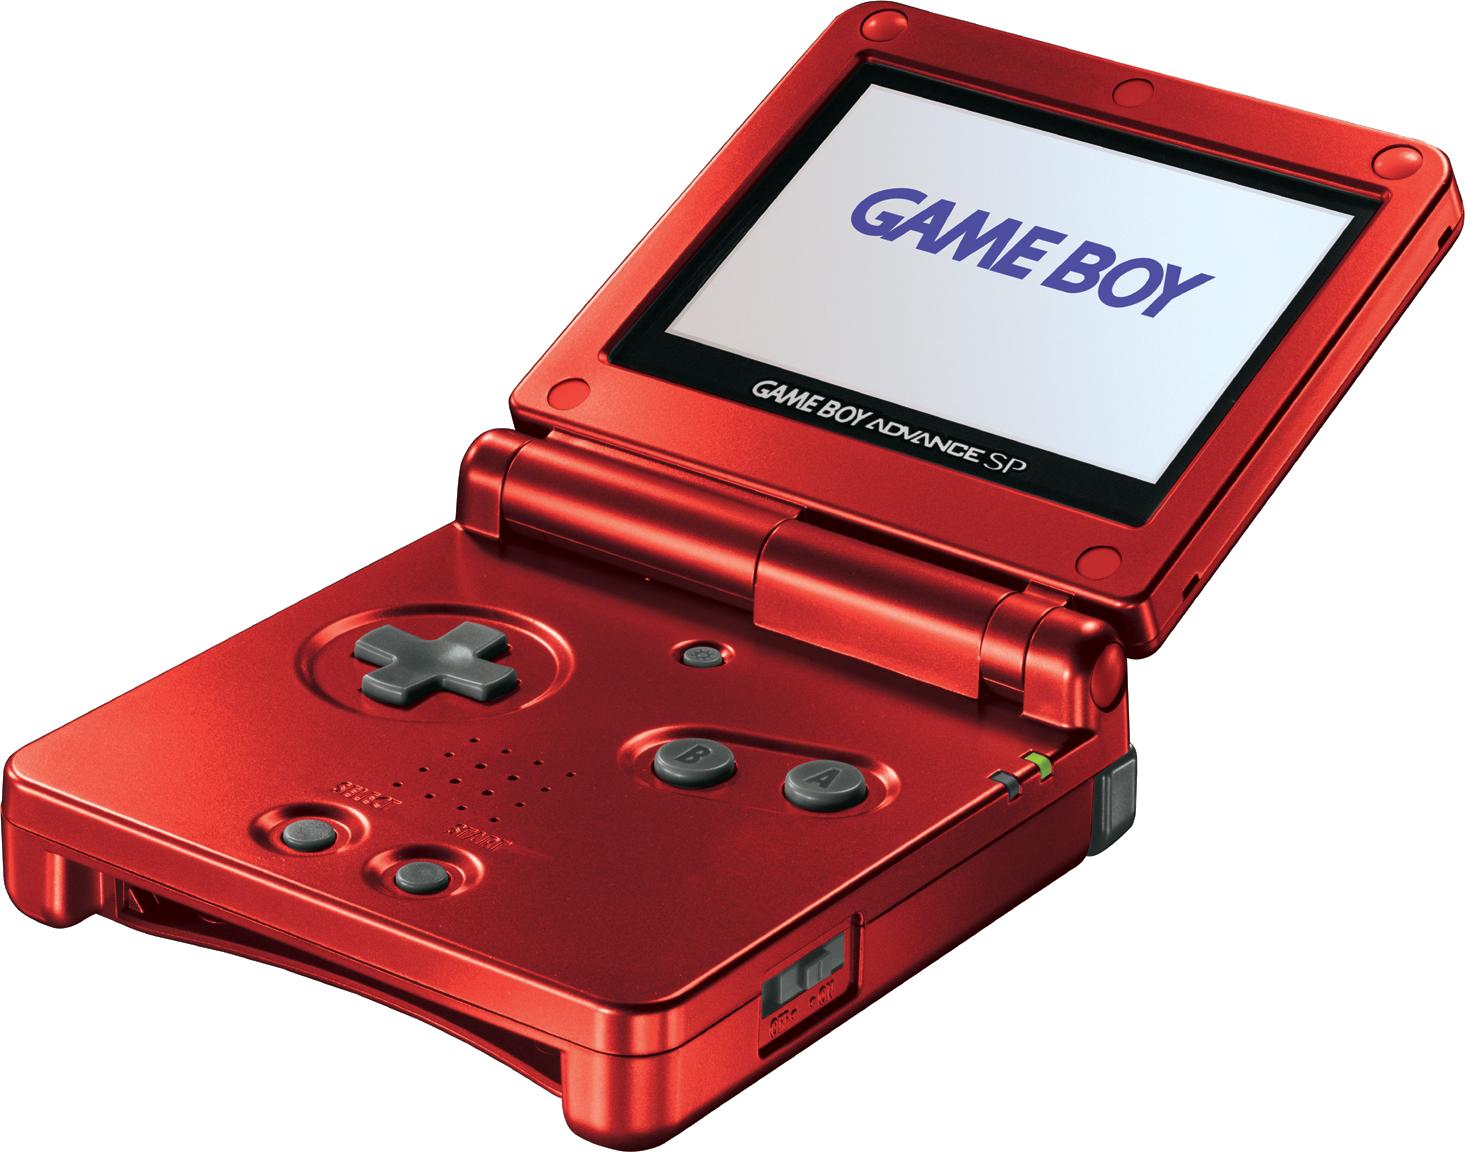 Game Boy Advance Sp Gameboy Game Boy Advance Sp Gameboy Advance Sp